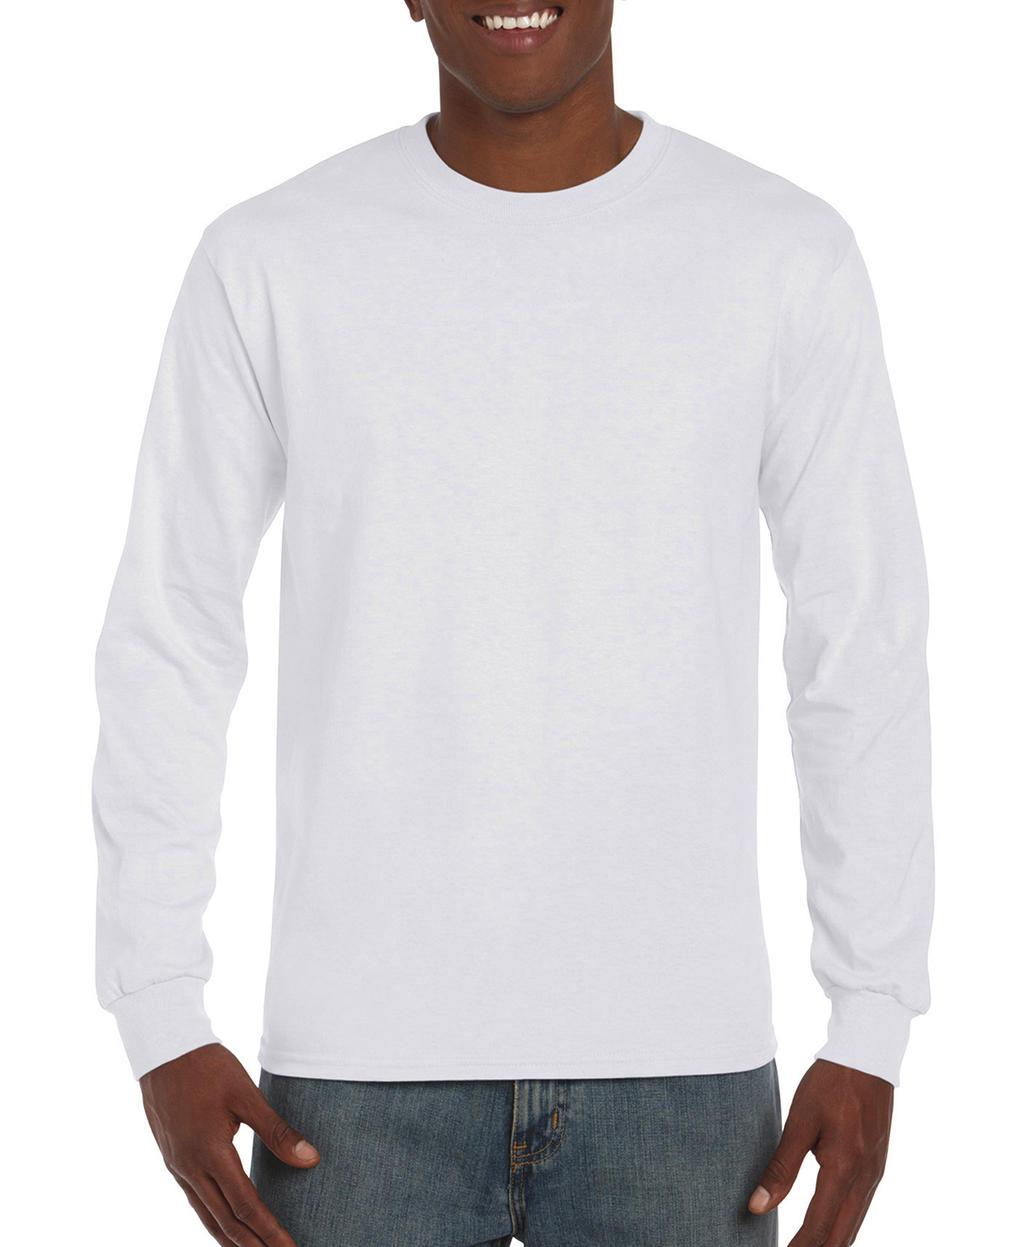 Hammer™ Adult Long Sleeve T-Shirt